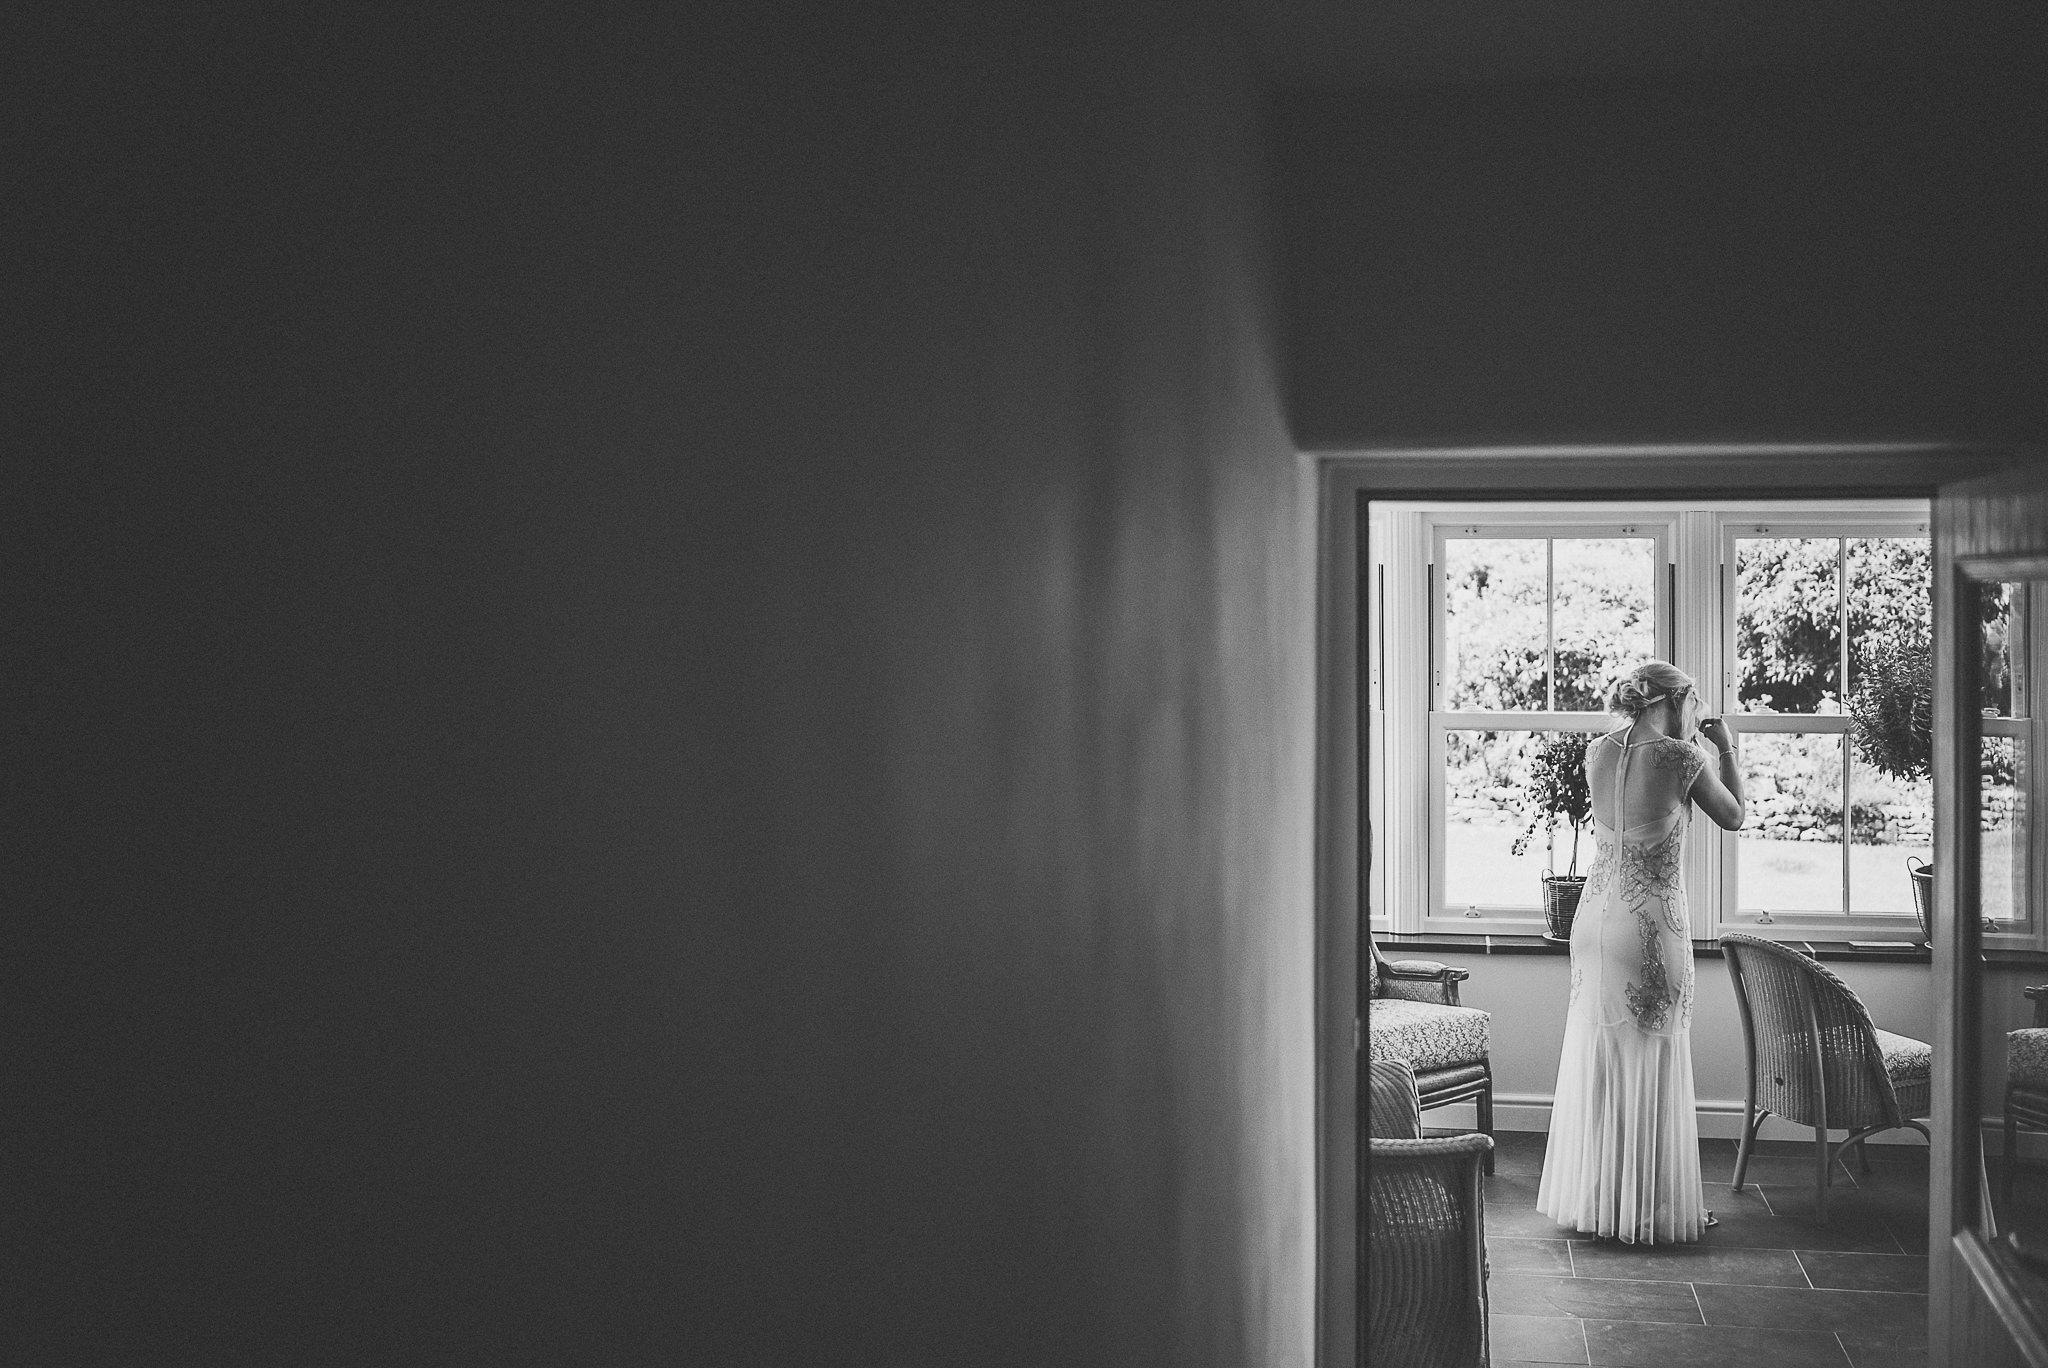 paul-marbrook-Farm-Wedding-Photographer-Lancashire-90015